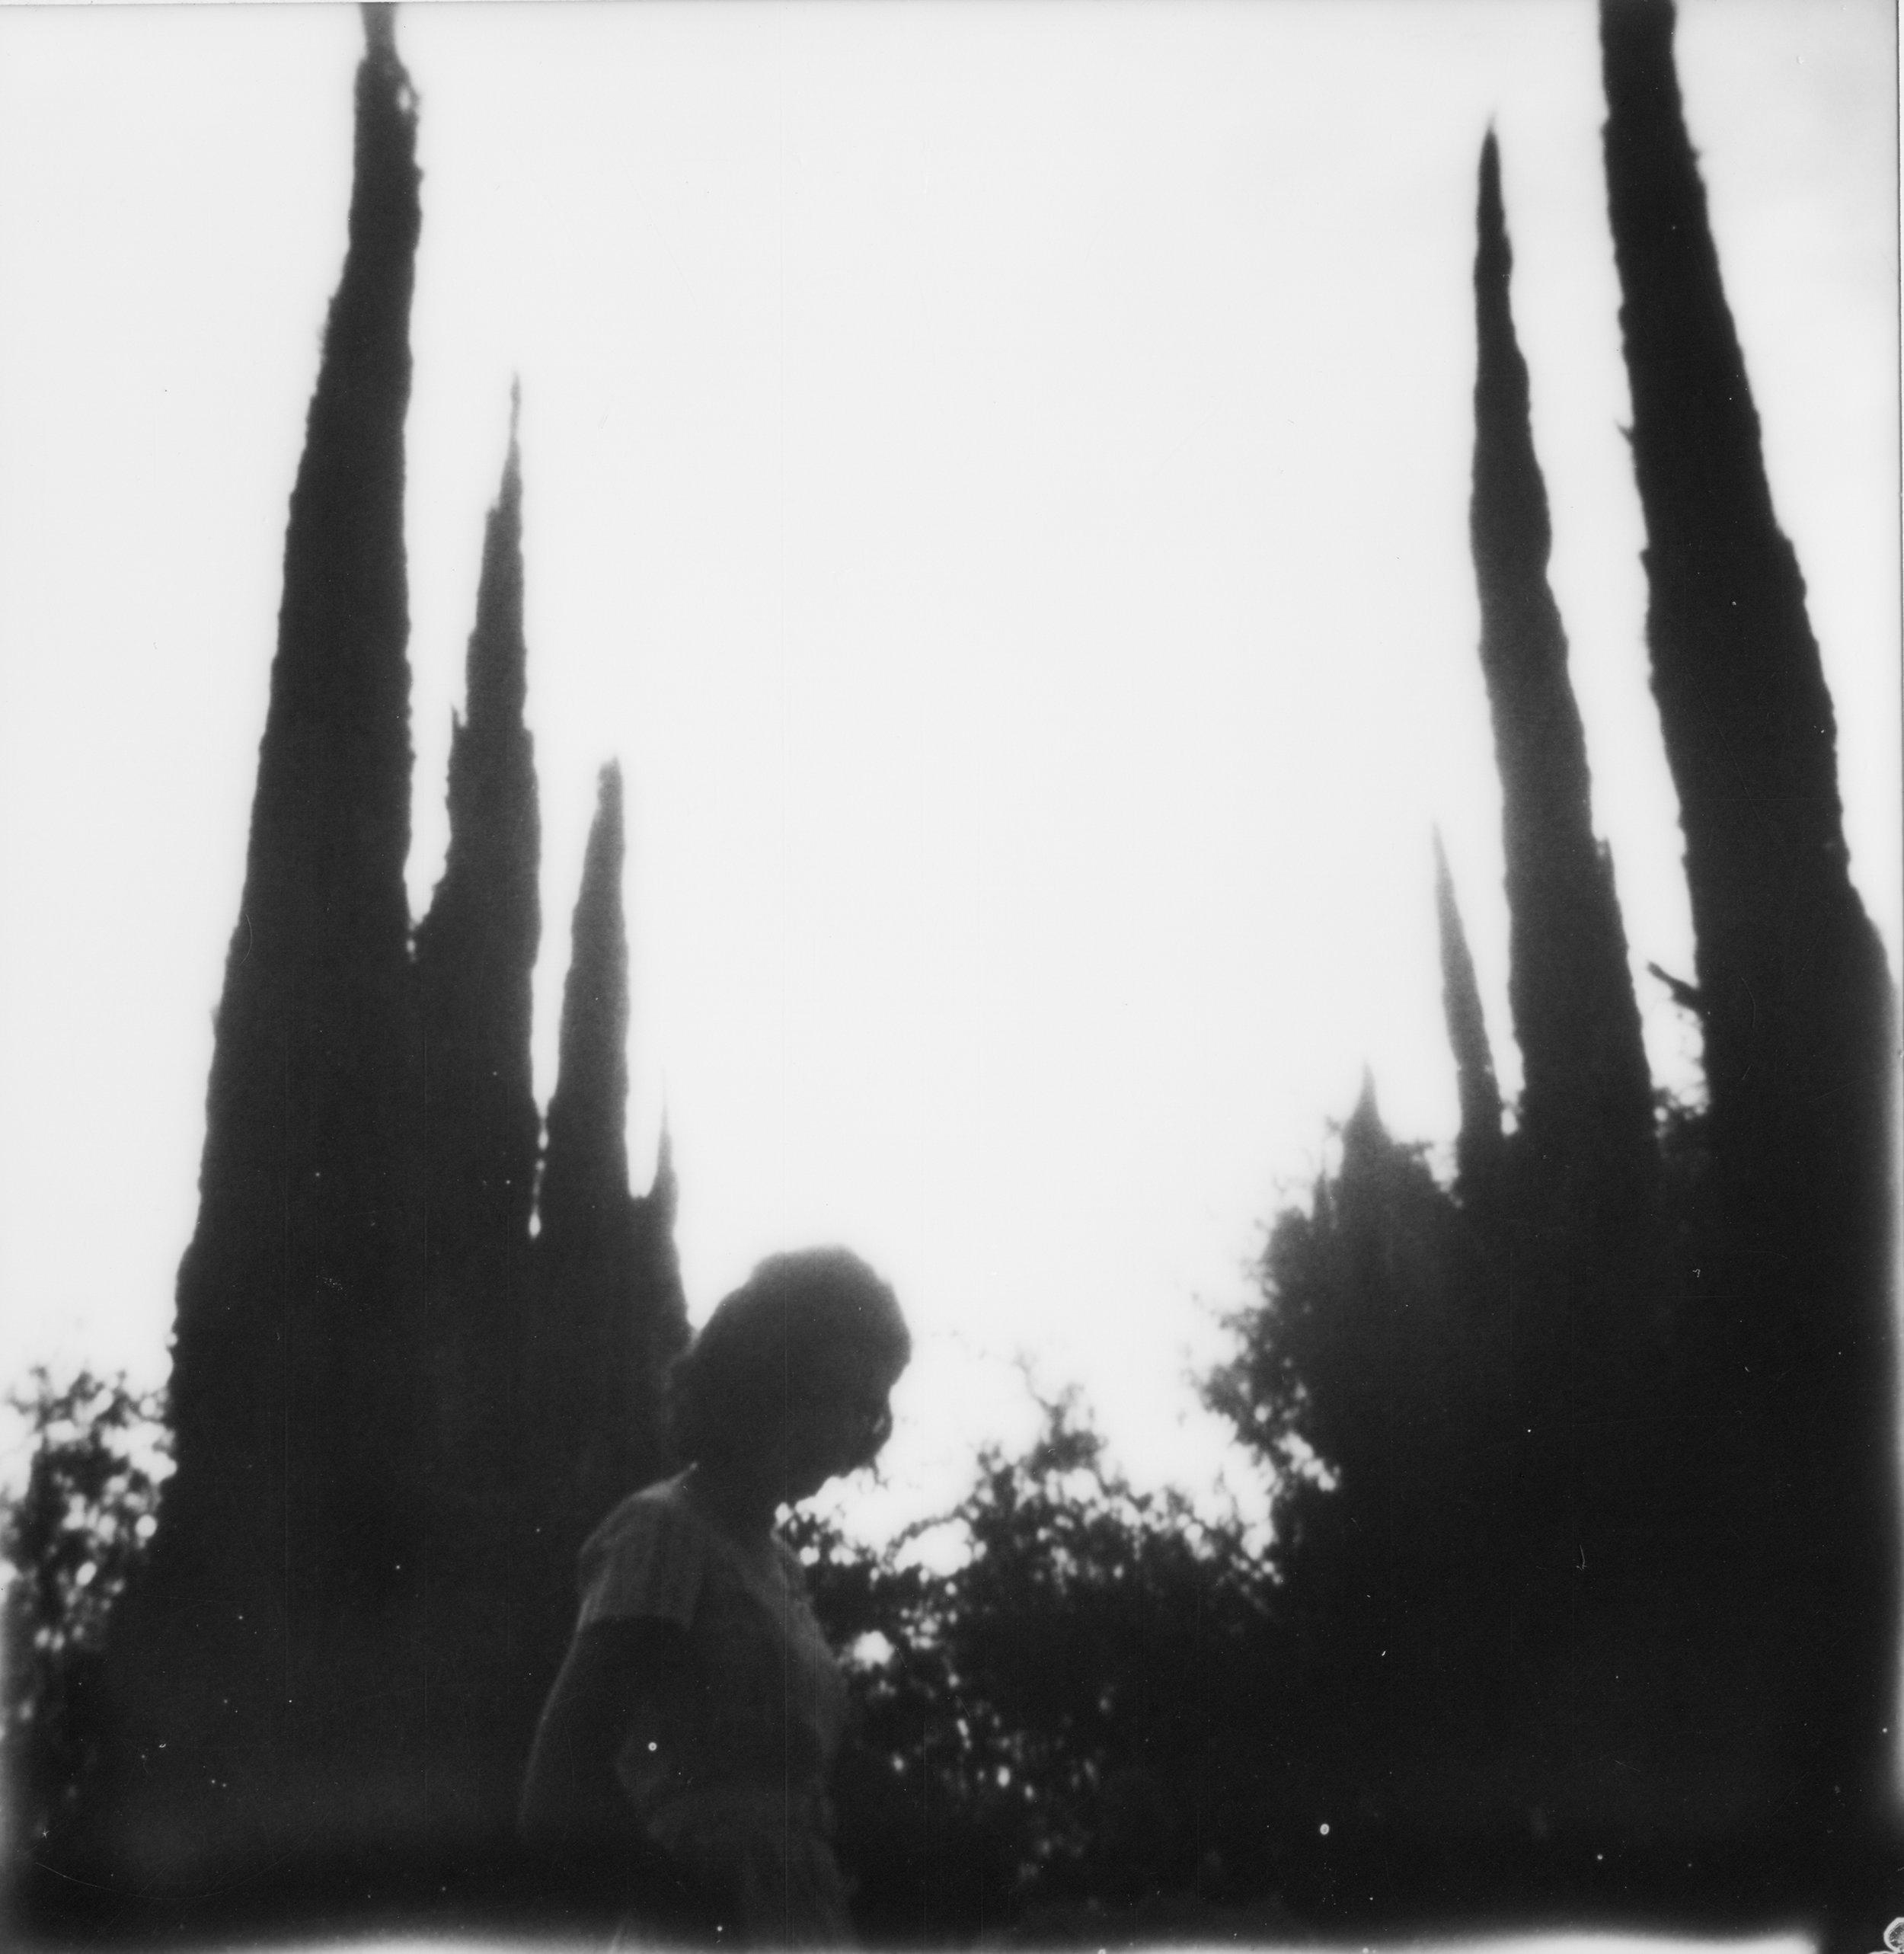 Arlington_PolaroidScan_21.jpg